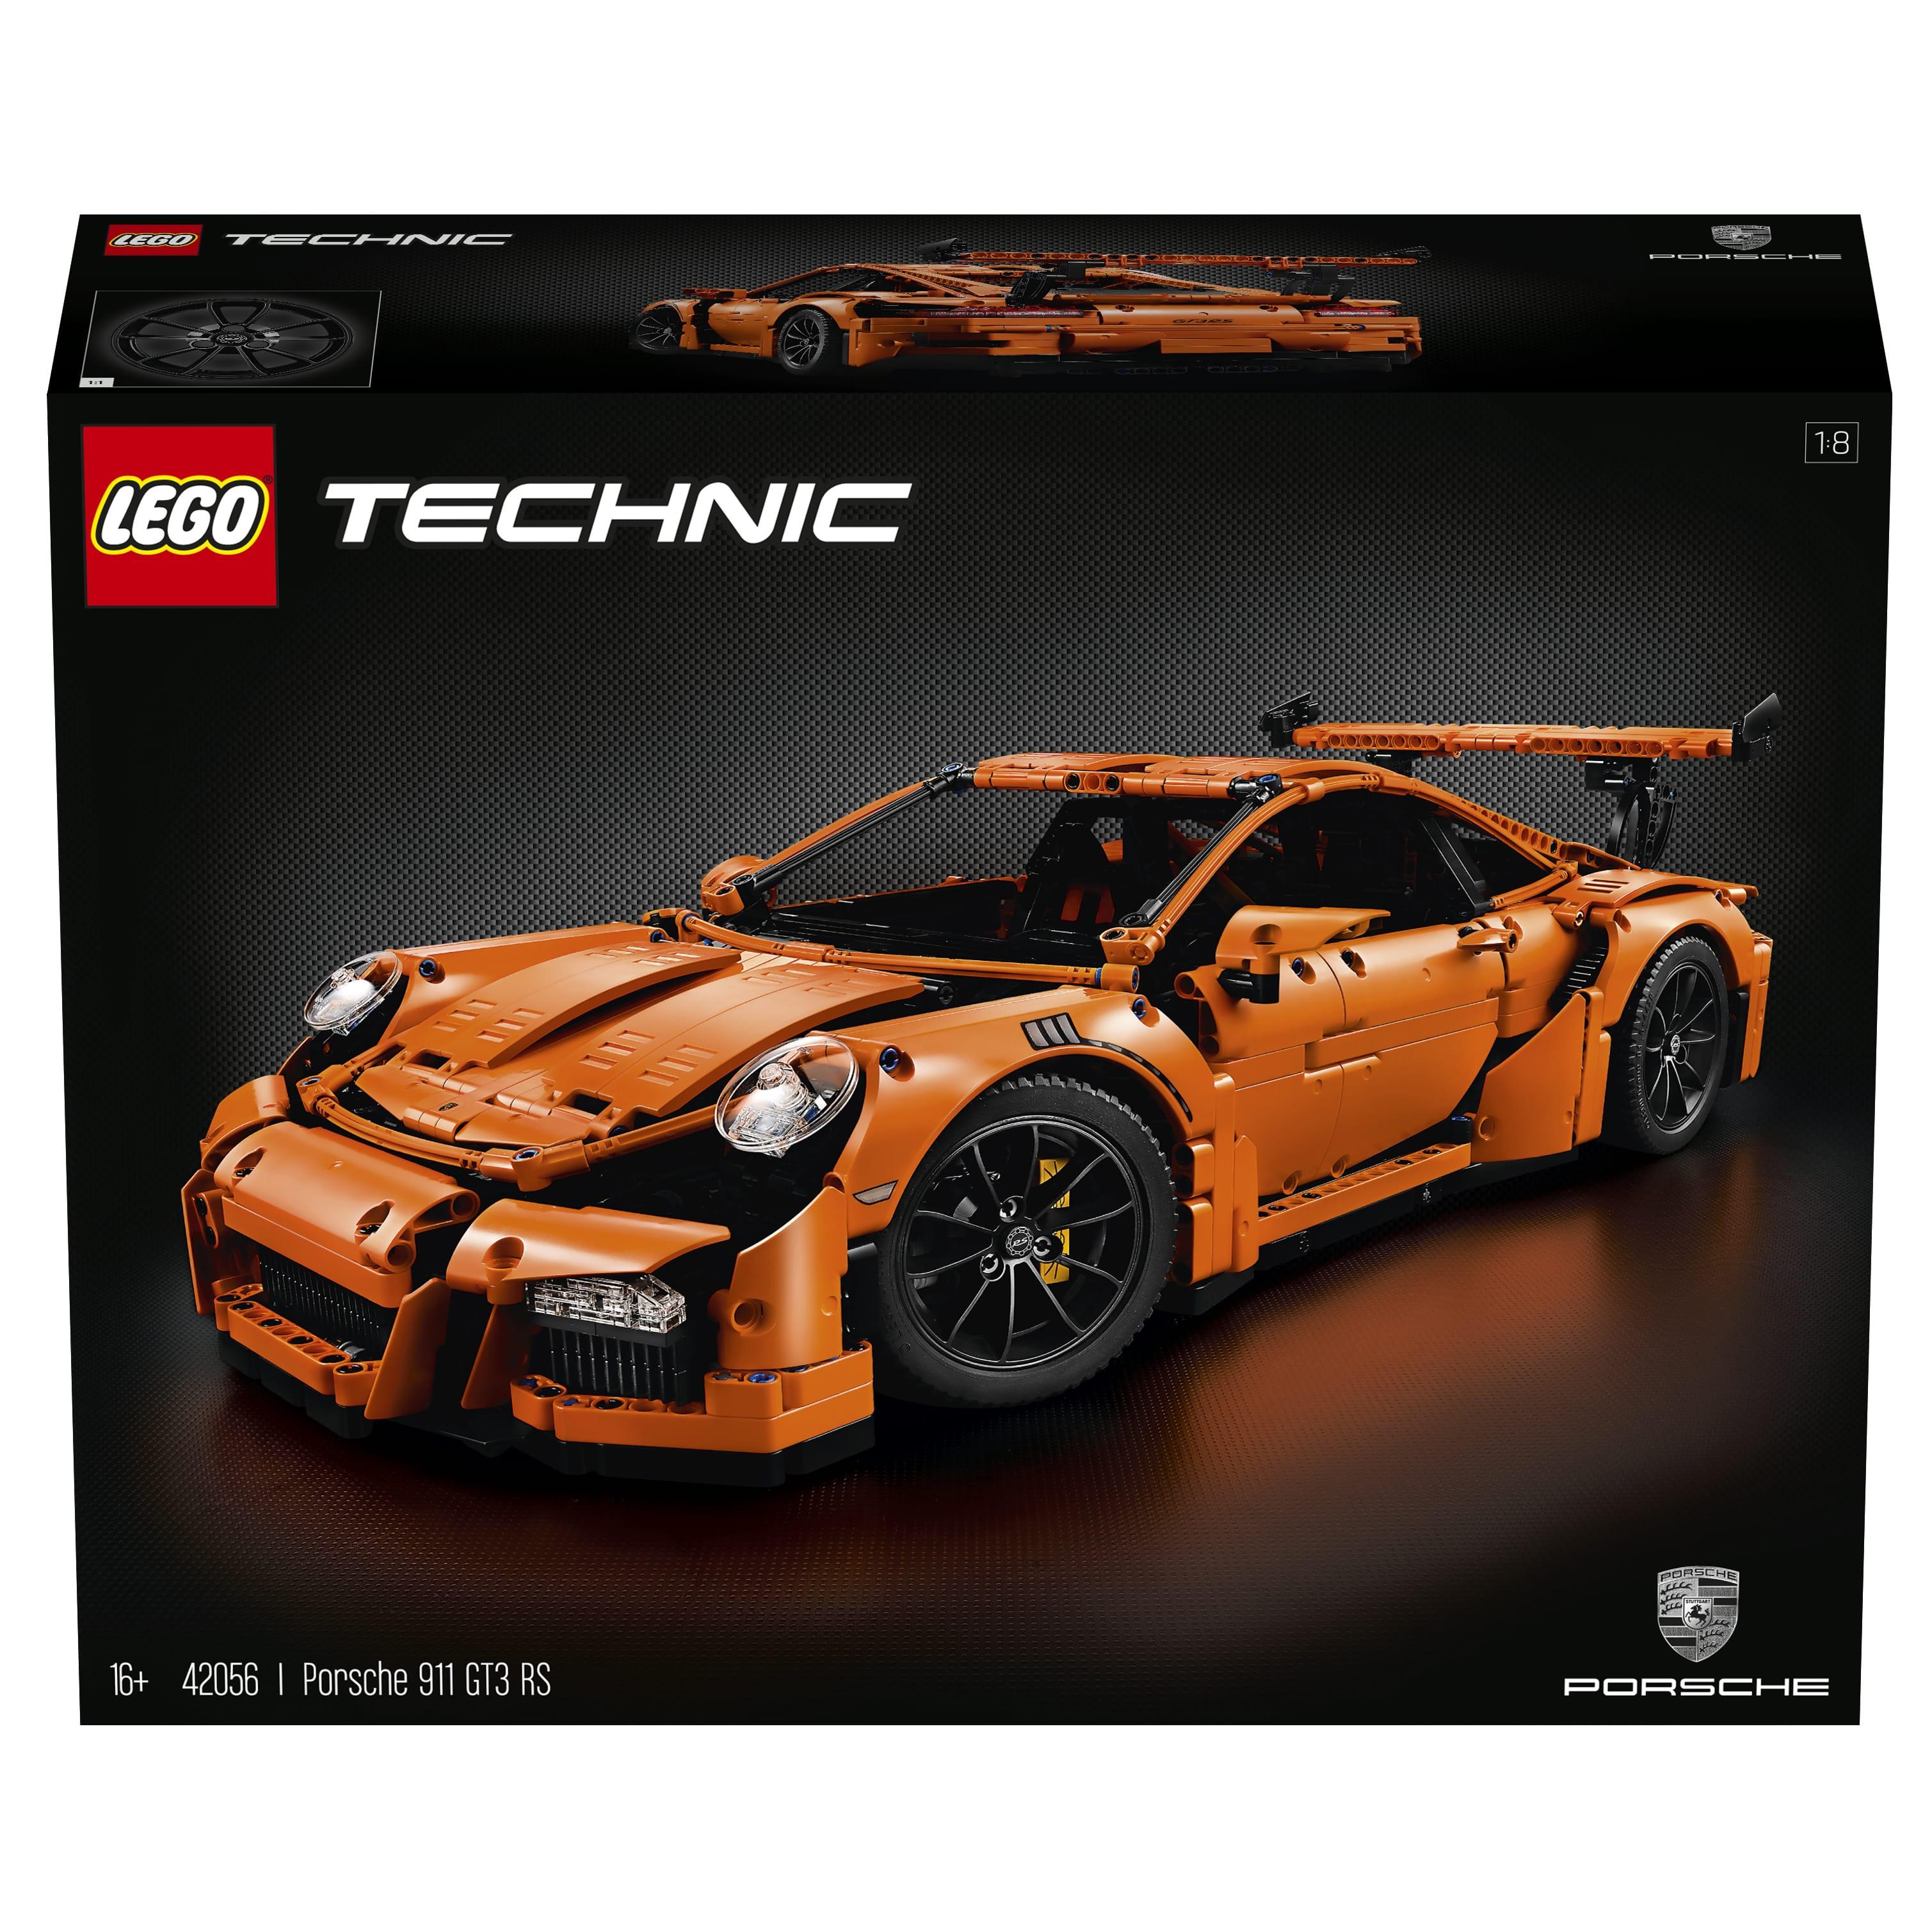 lego technic porsche 911 gt3 rs 42056 officially. Black Bedroom Furniture Sets. Home Design Ideas